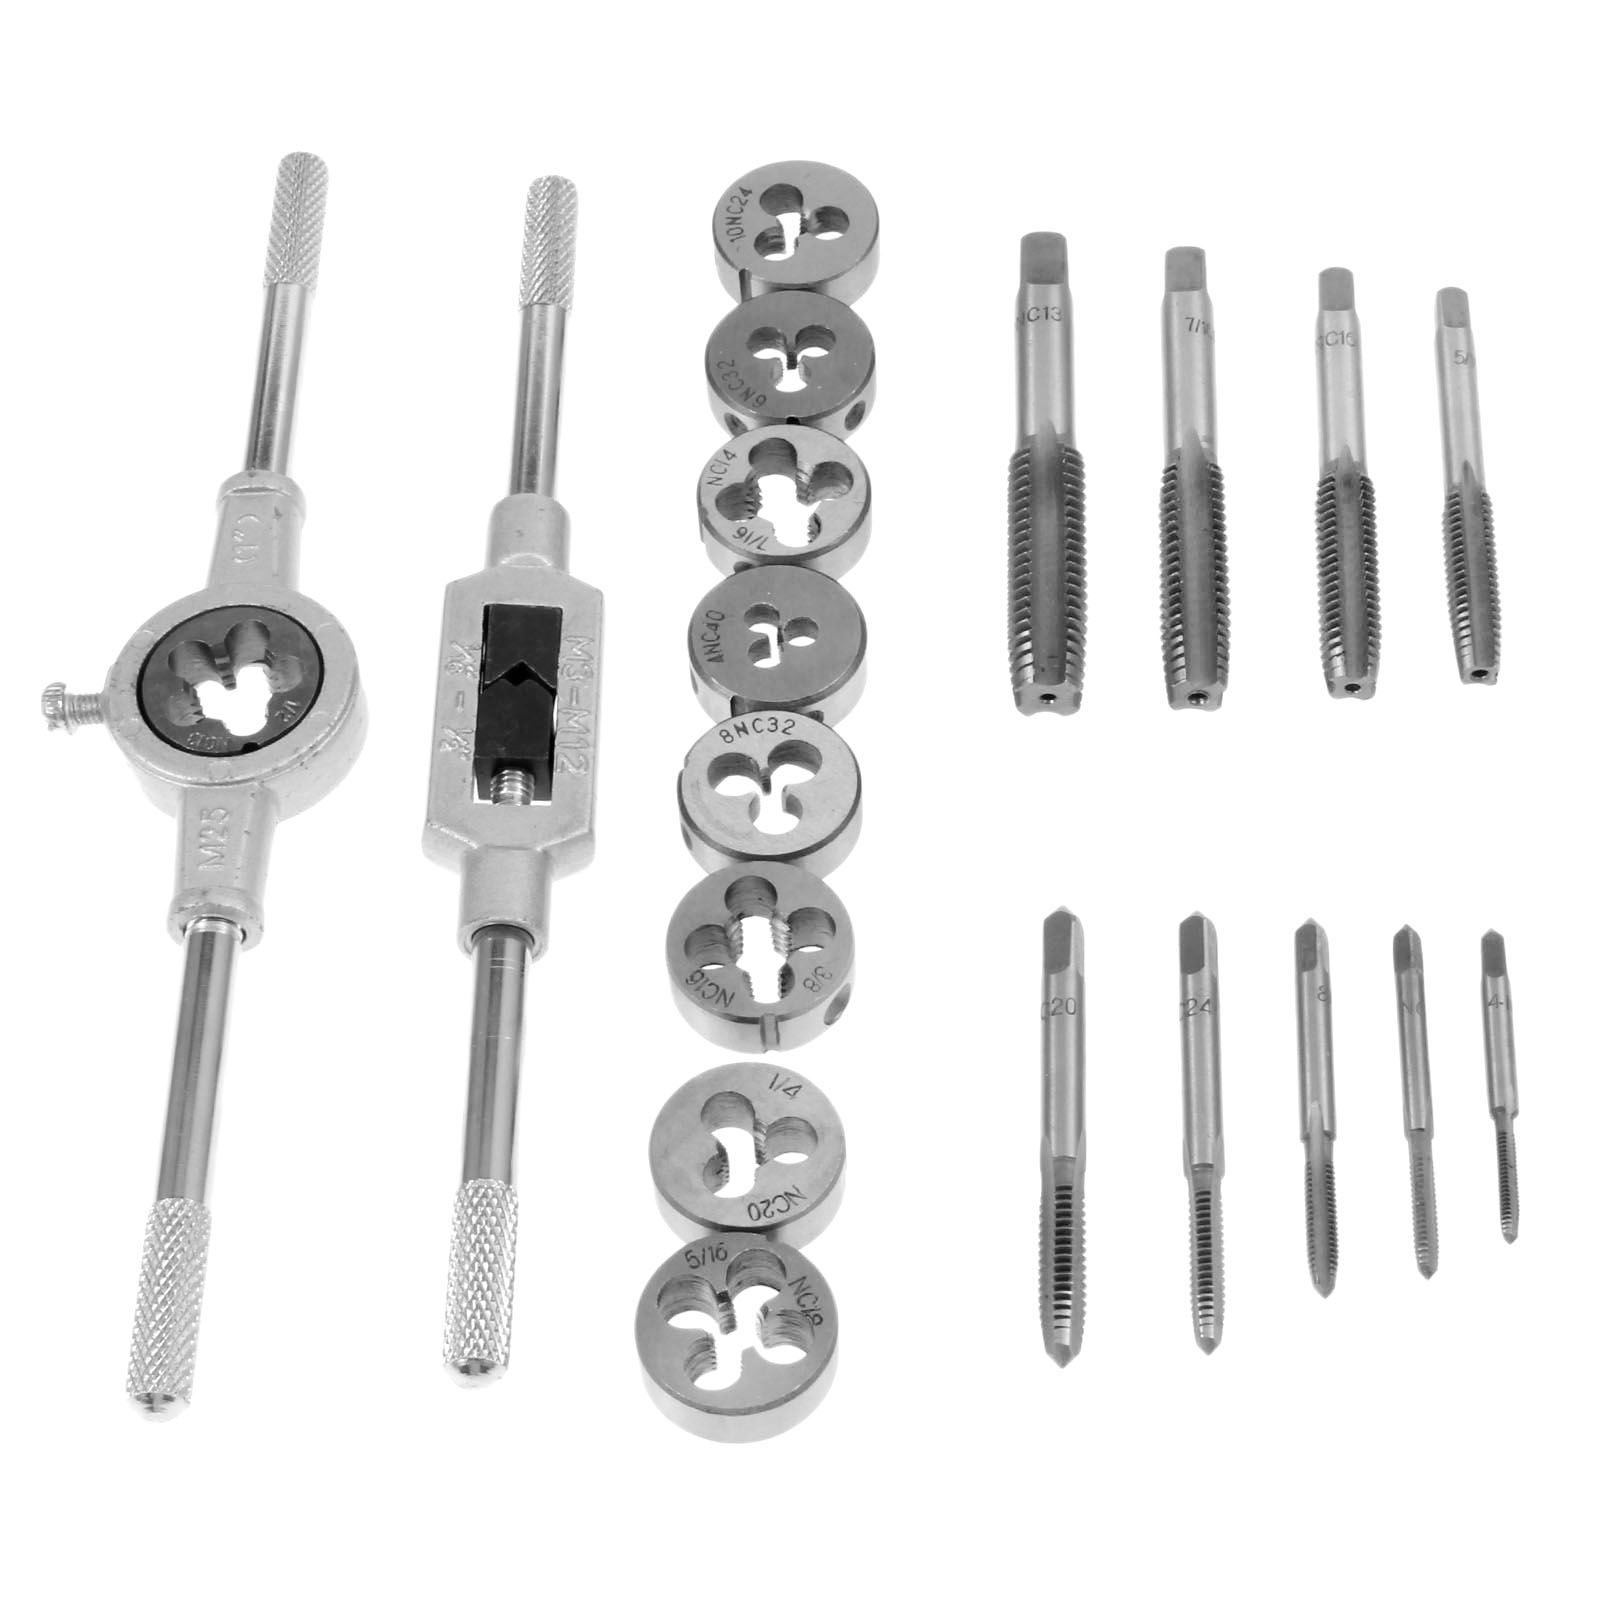 DRELD 20Pcs Inch Tap Dies Set 1 2  -6  NC Screw Thread Inch Plugs Taps Alloy Steel Hand Screw Taps Tap Die Wrench Set Hand Tools